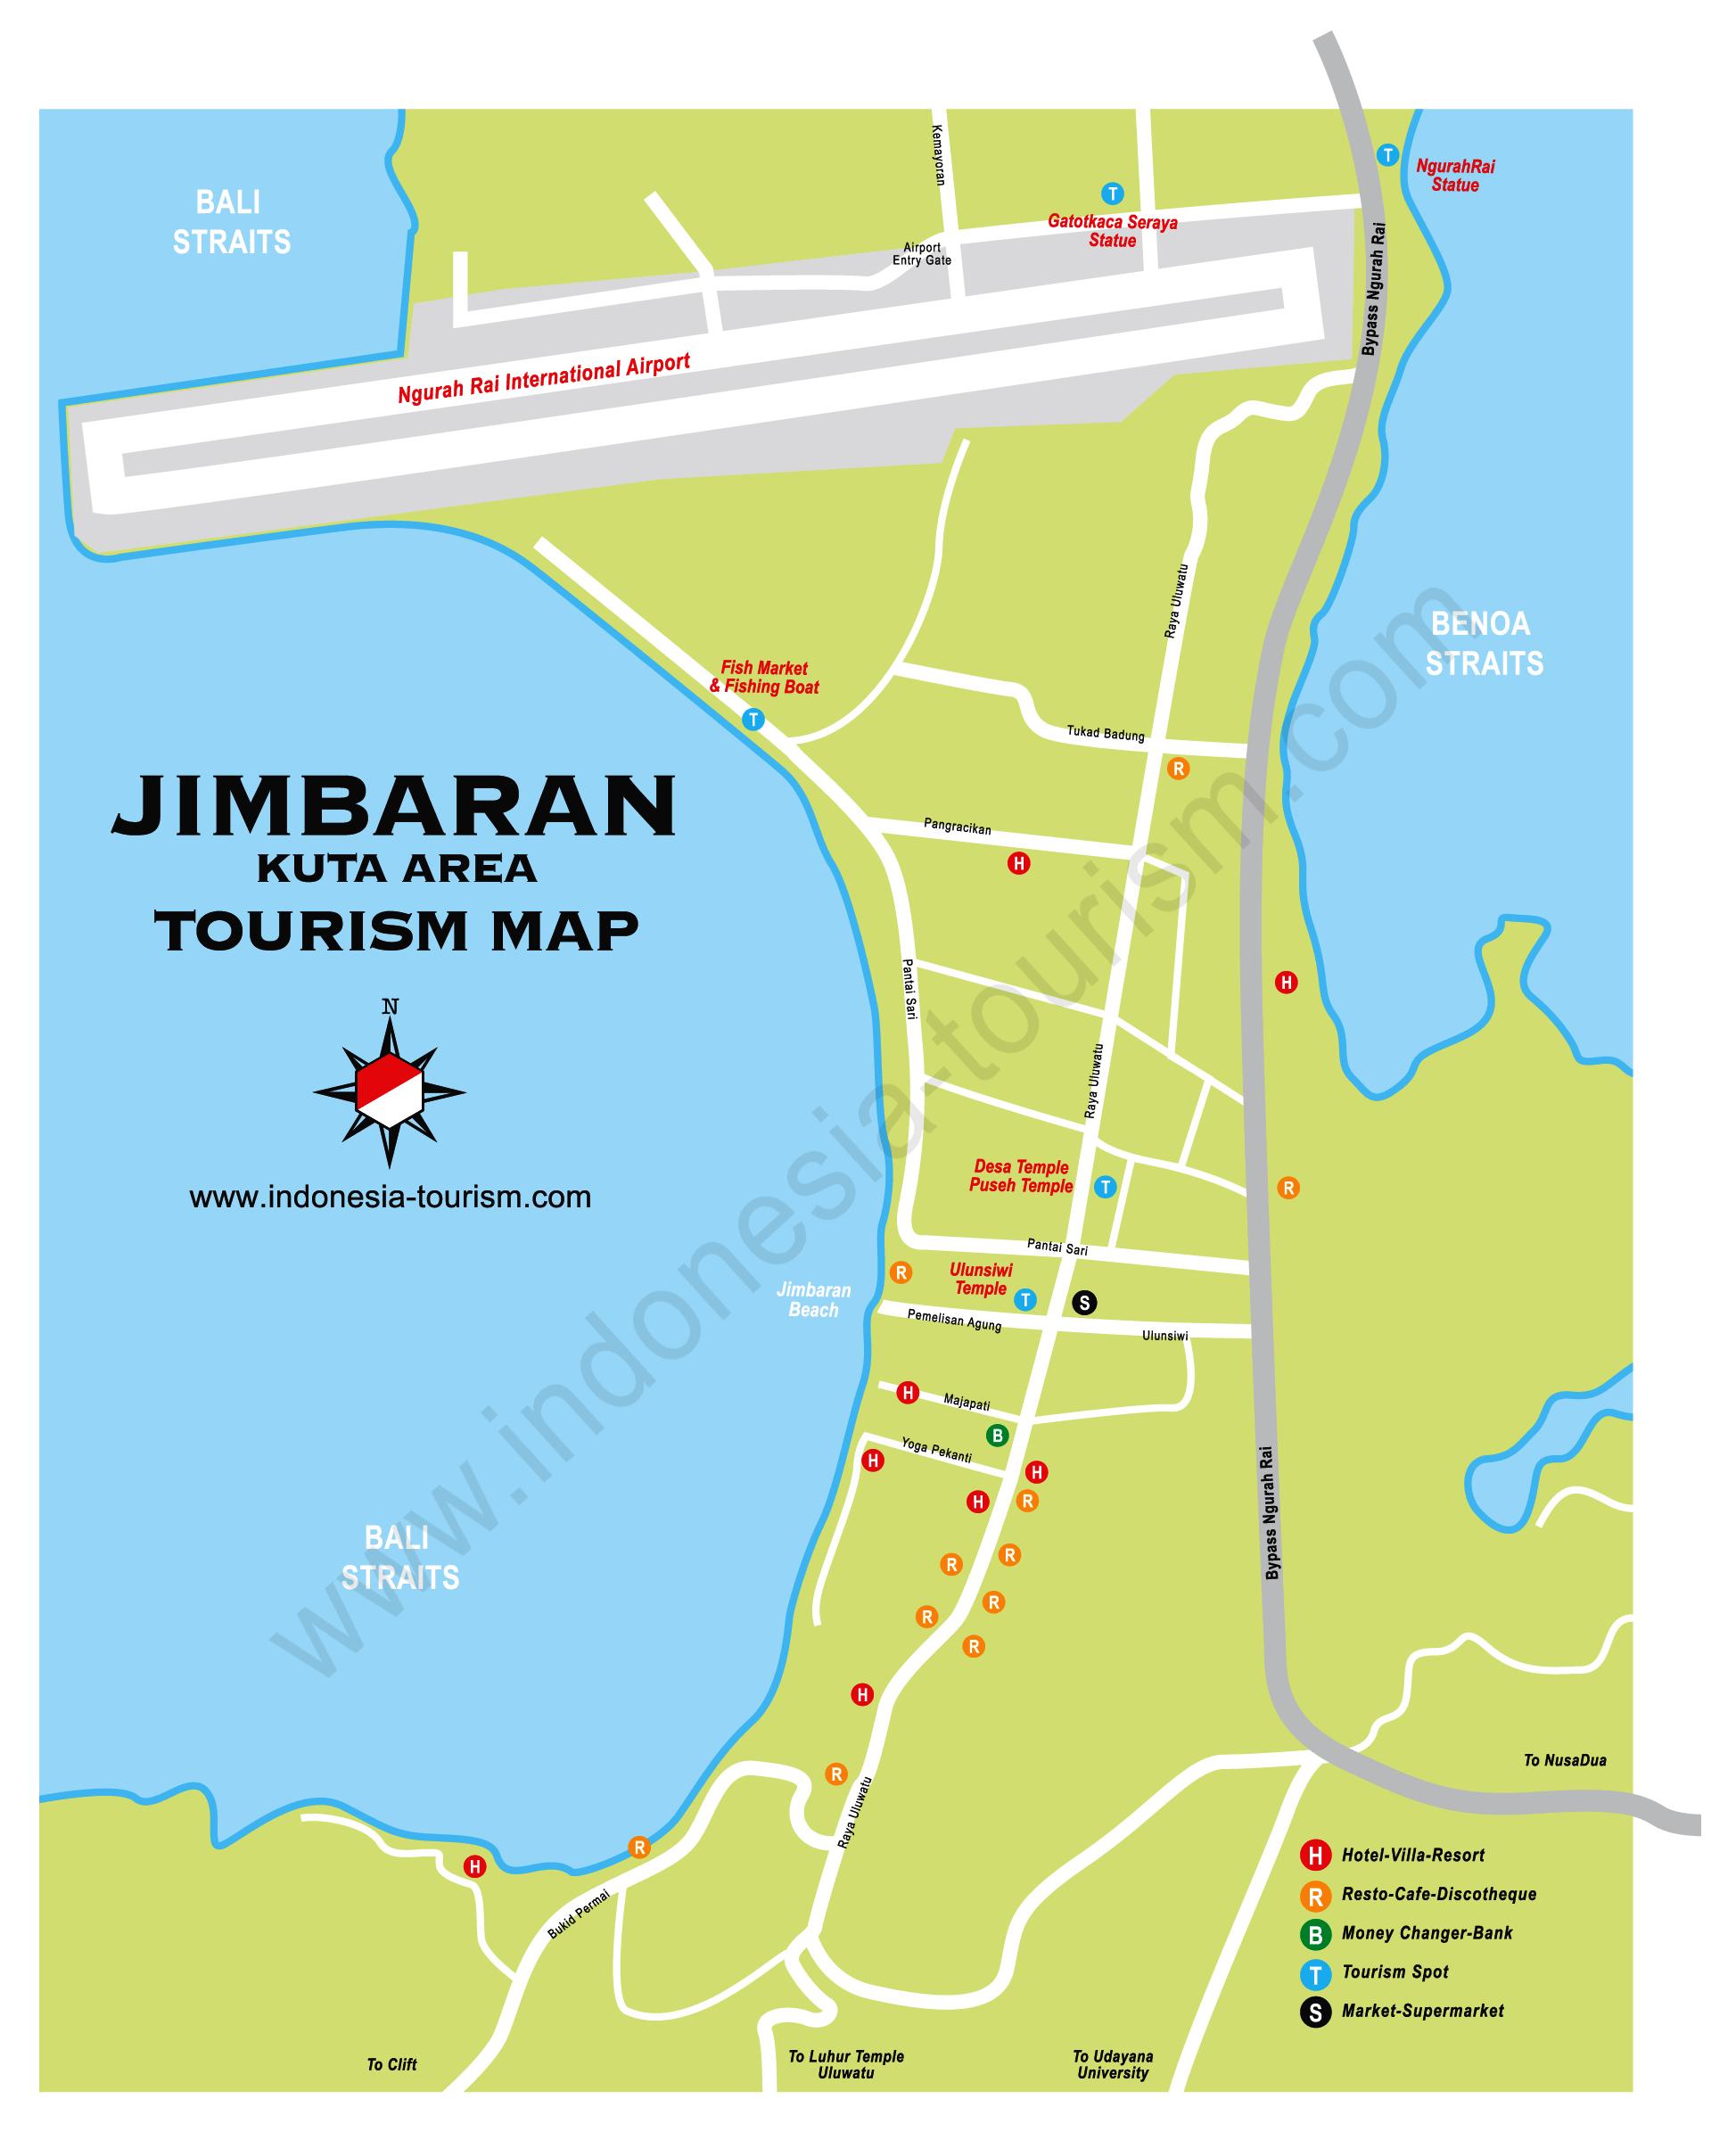 Jimbaran Bali Map Bali Island Indonesia Tourism Maps